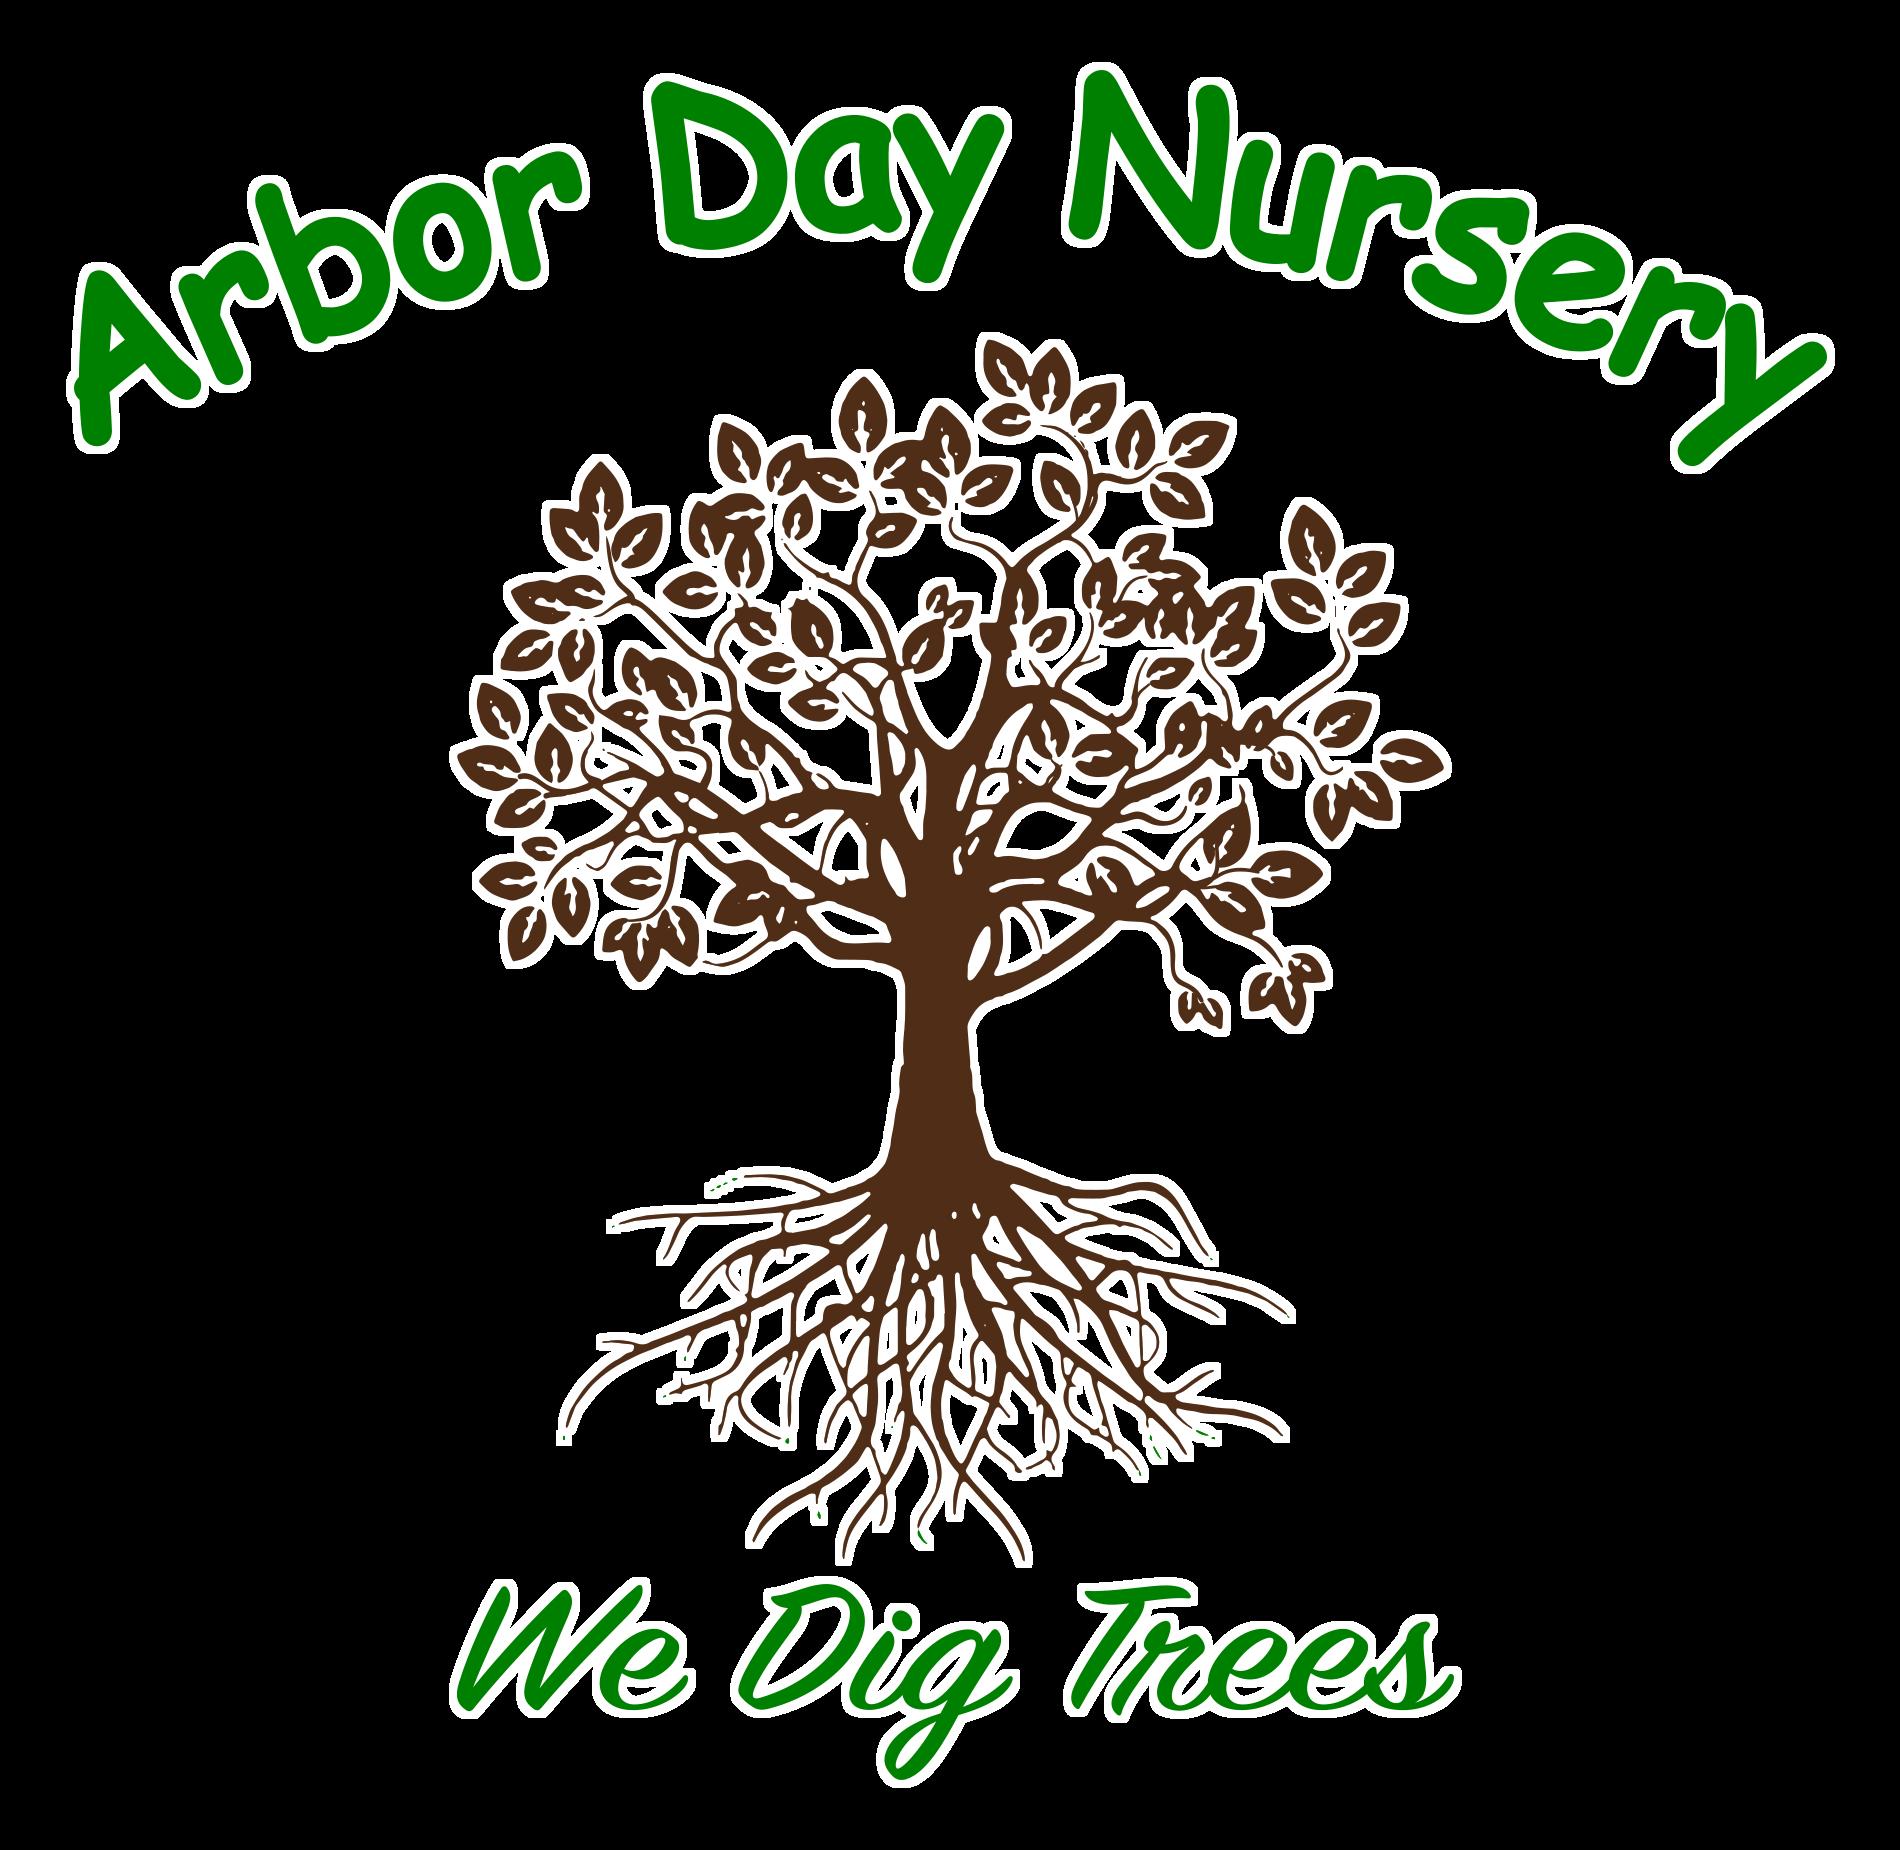 Arbor Day Nursery Garden Center In